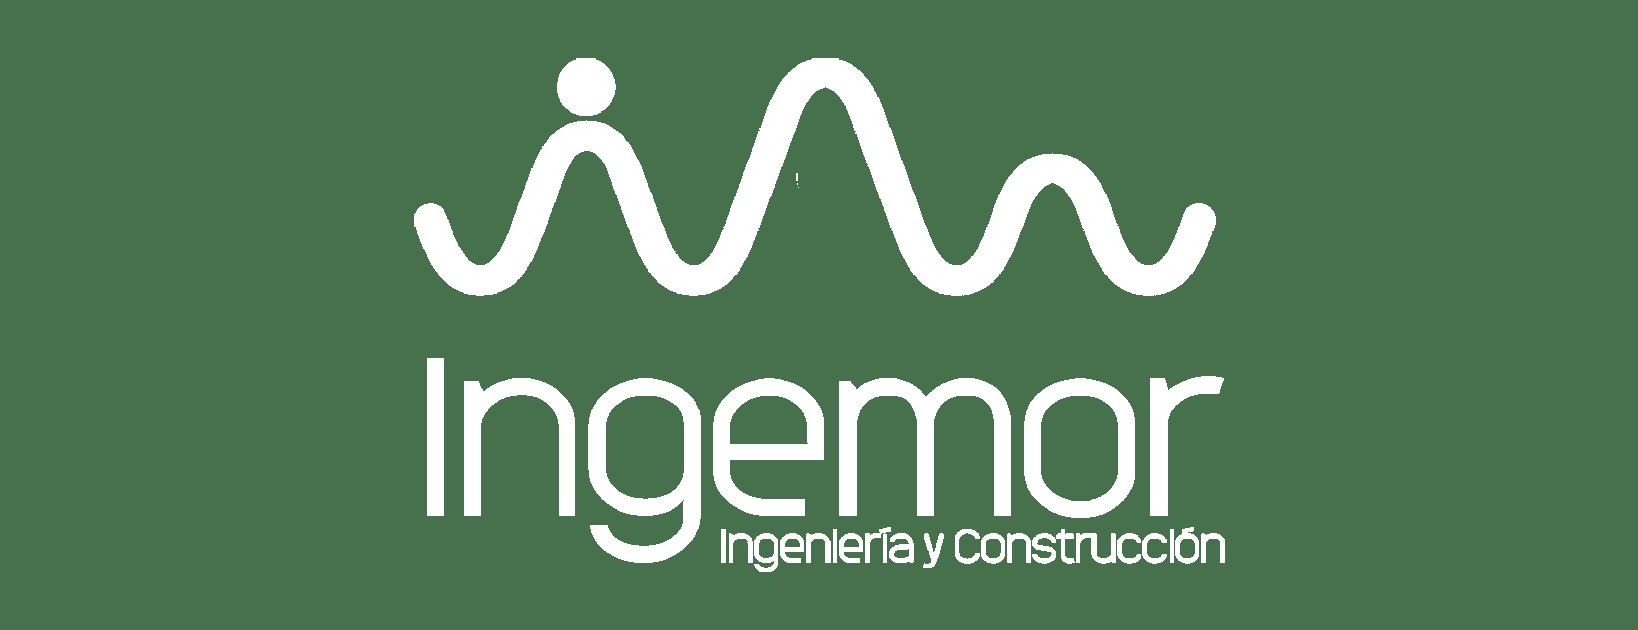 logo_0012_logo1